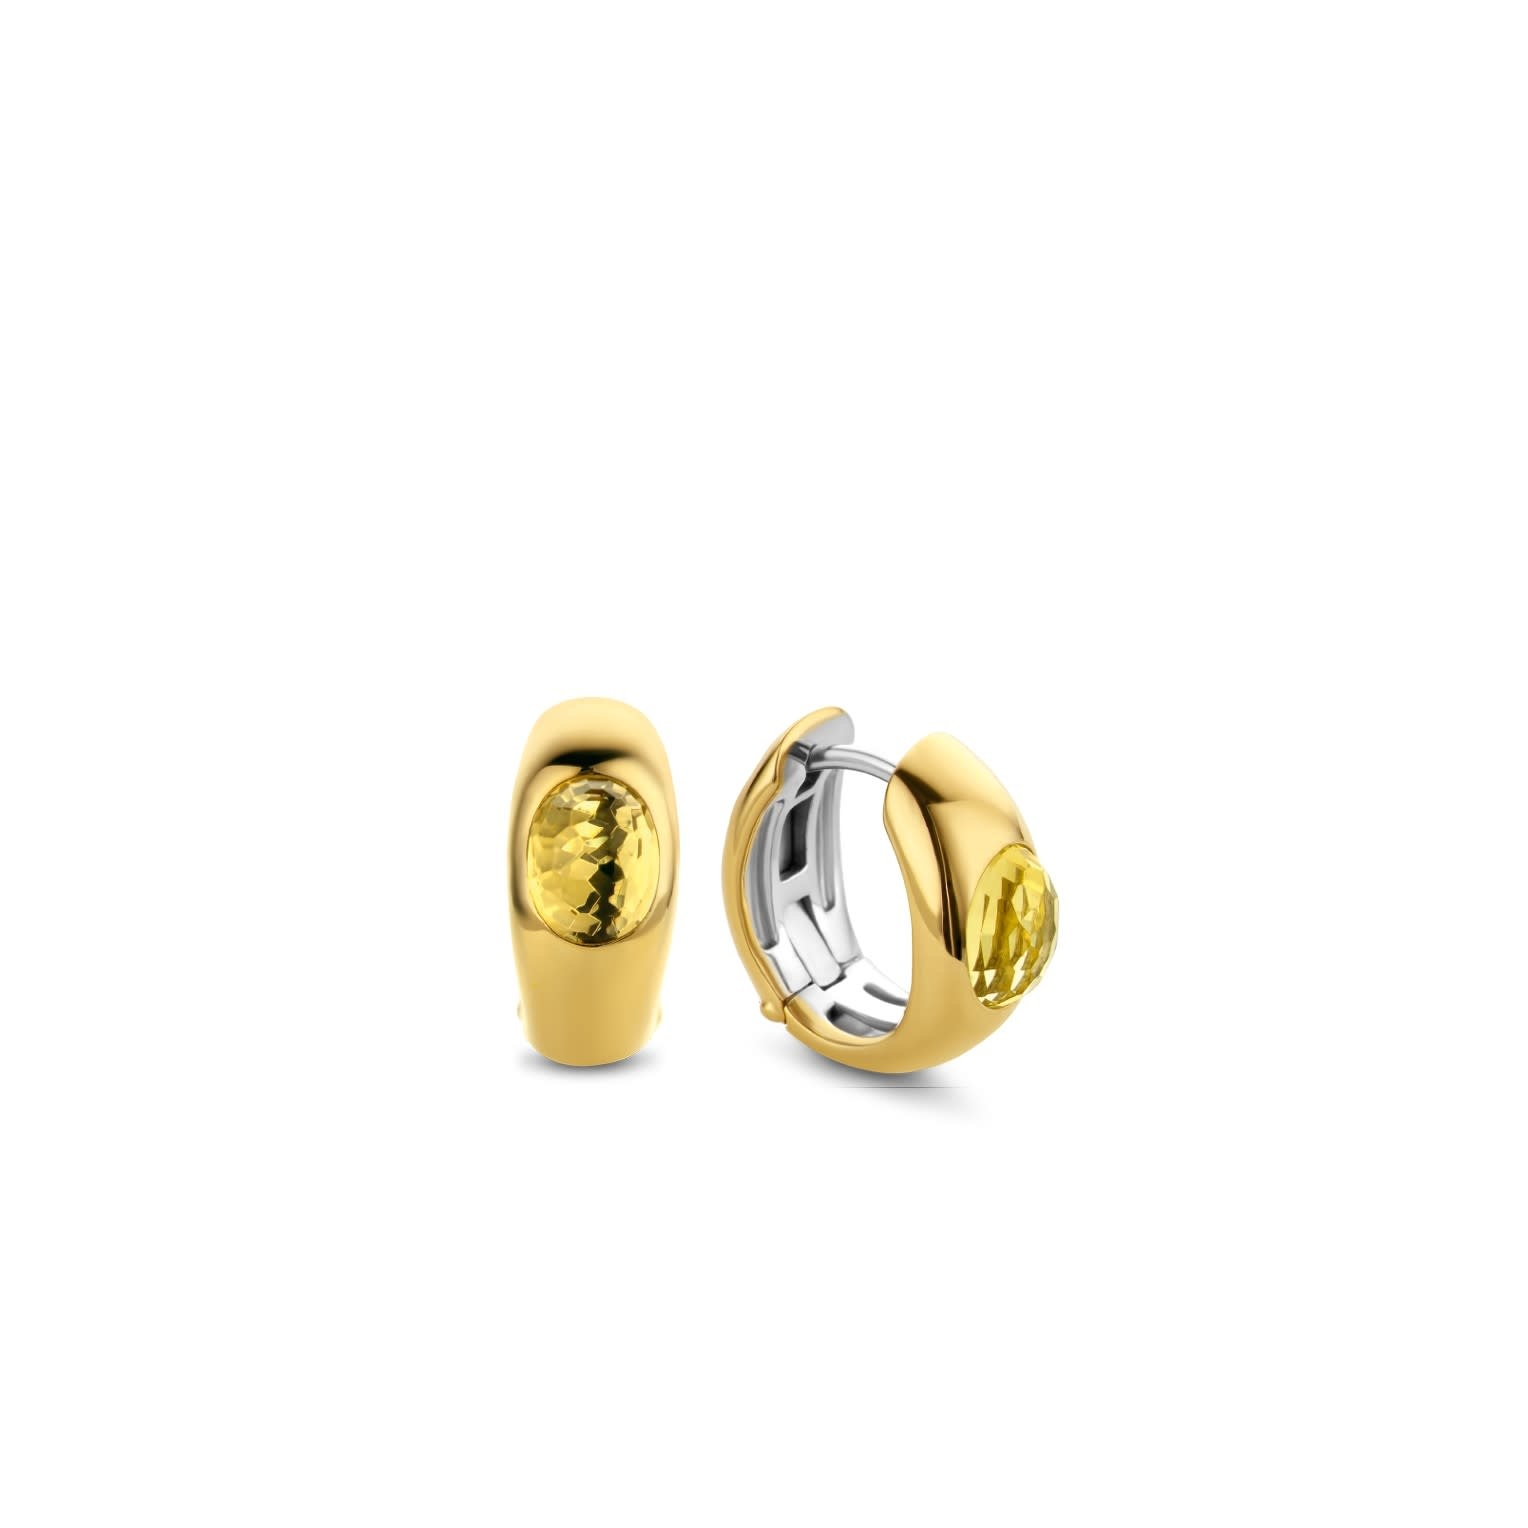 TI SENTO - Milano Earrings 7805TY-1